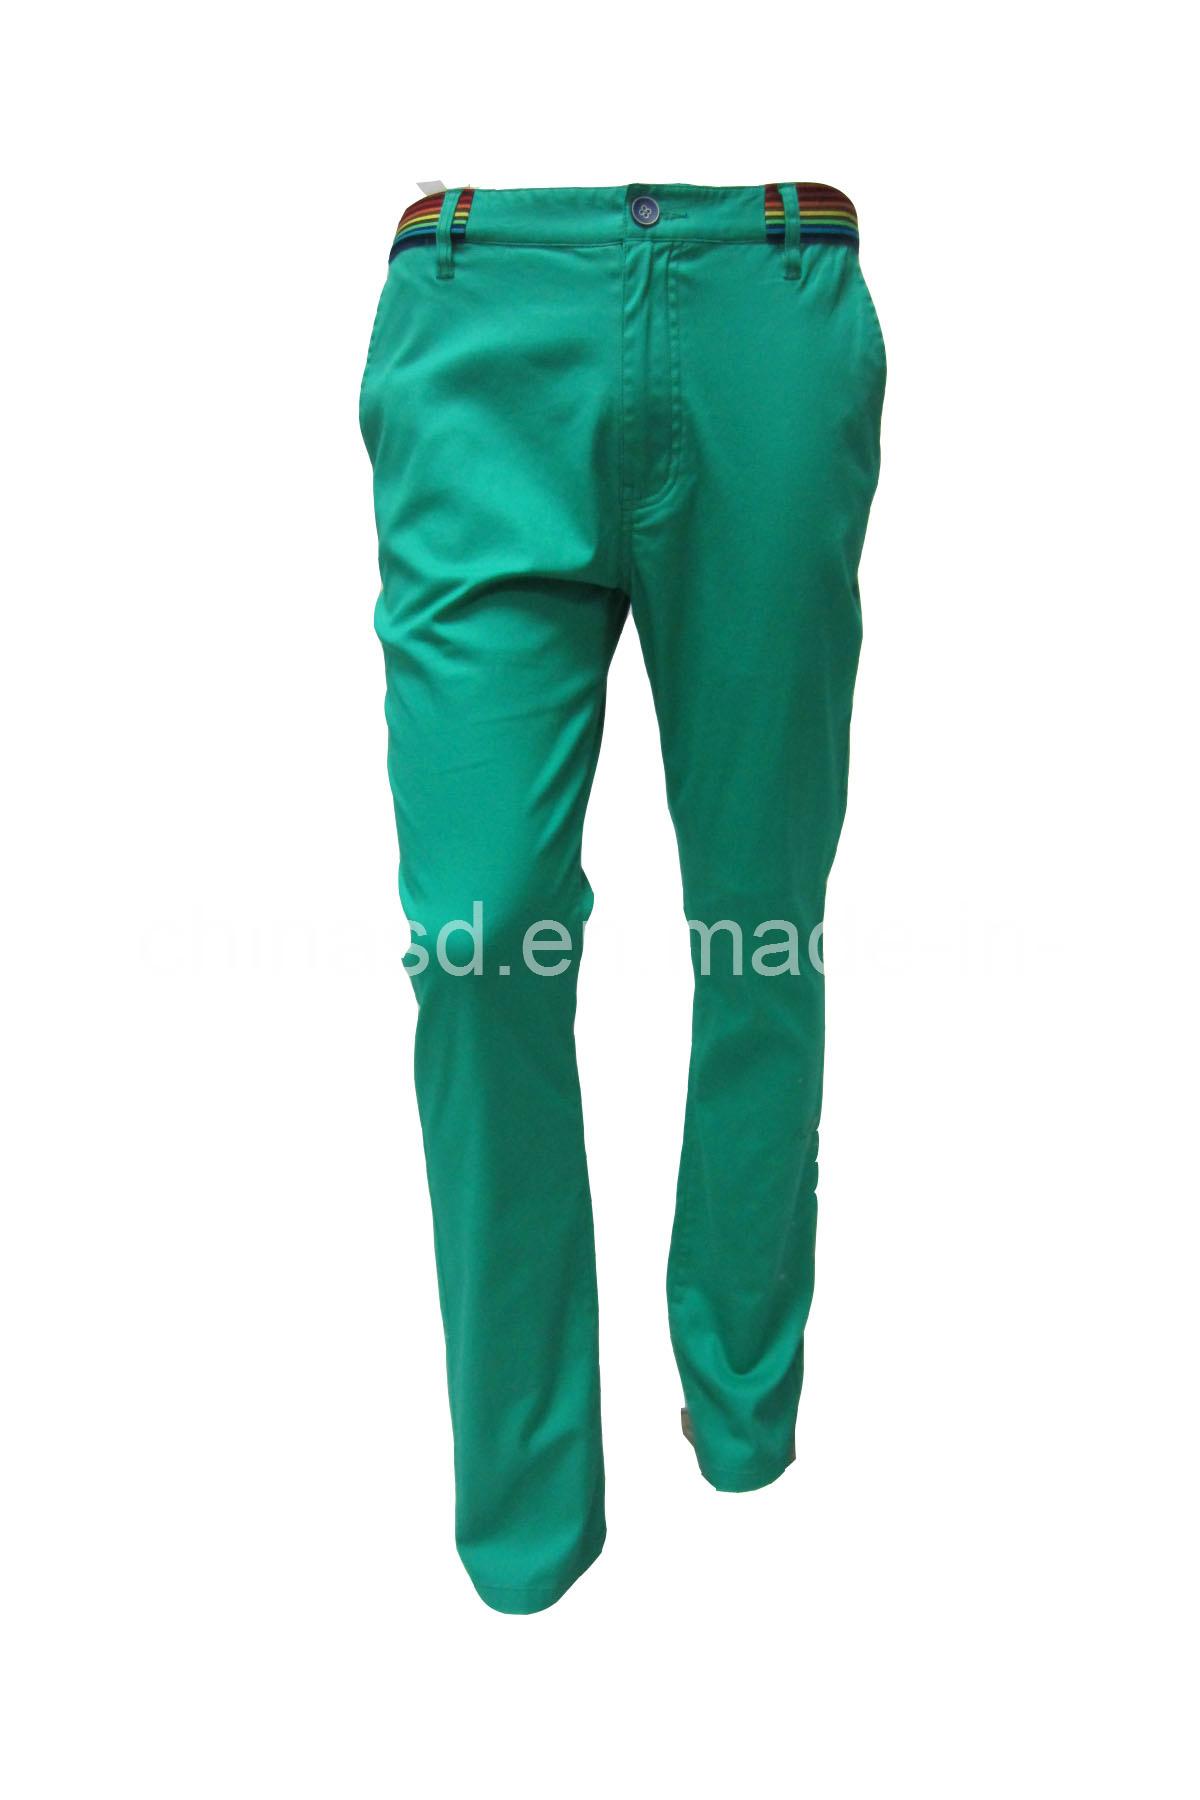 Latest Pants For Men